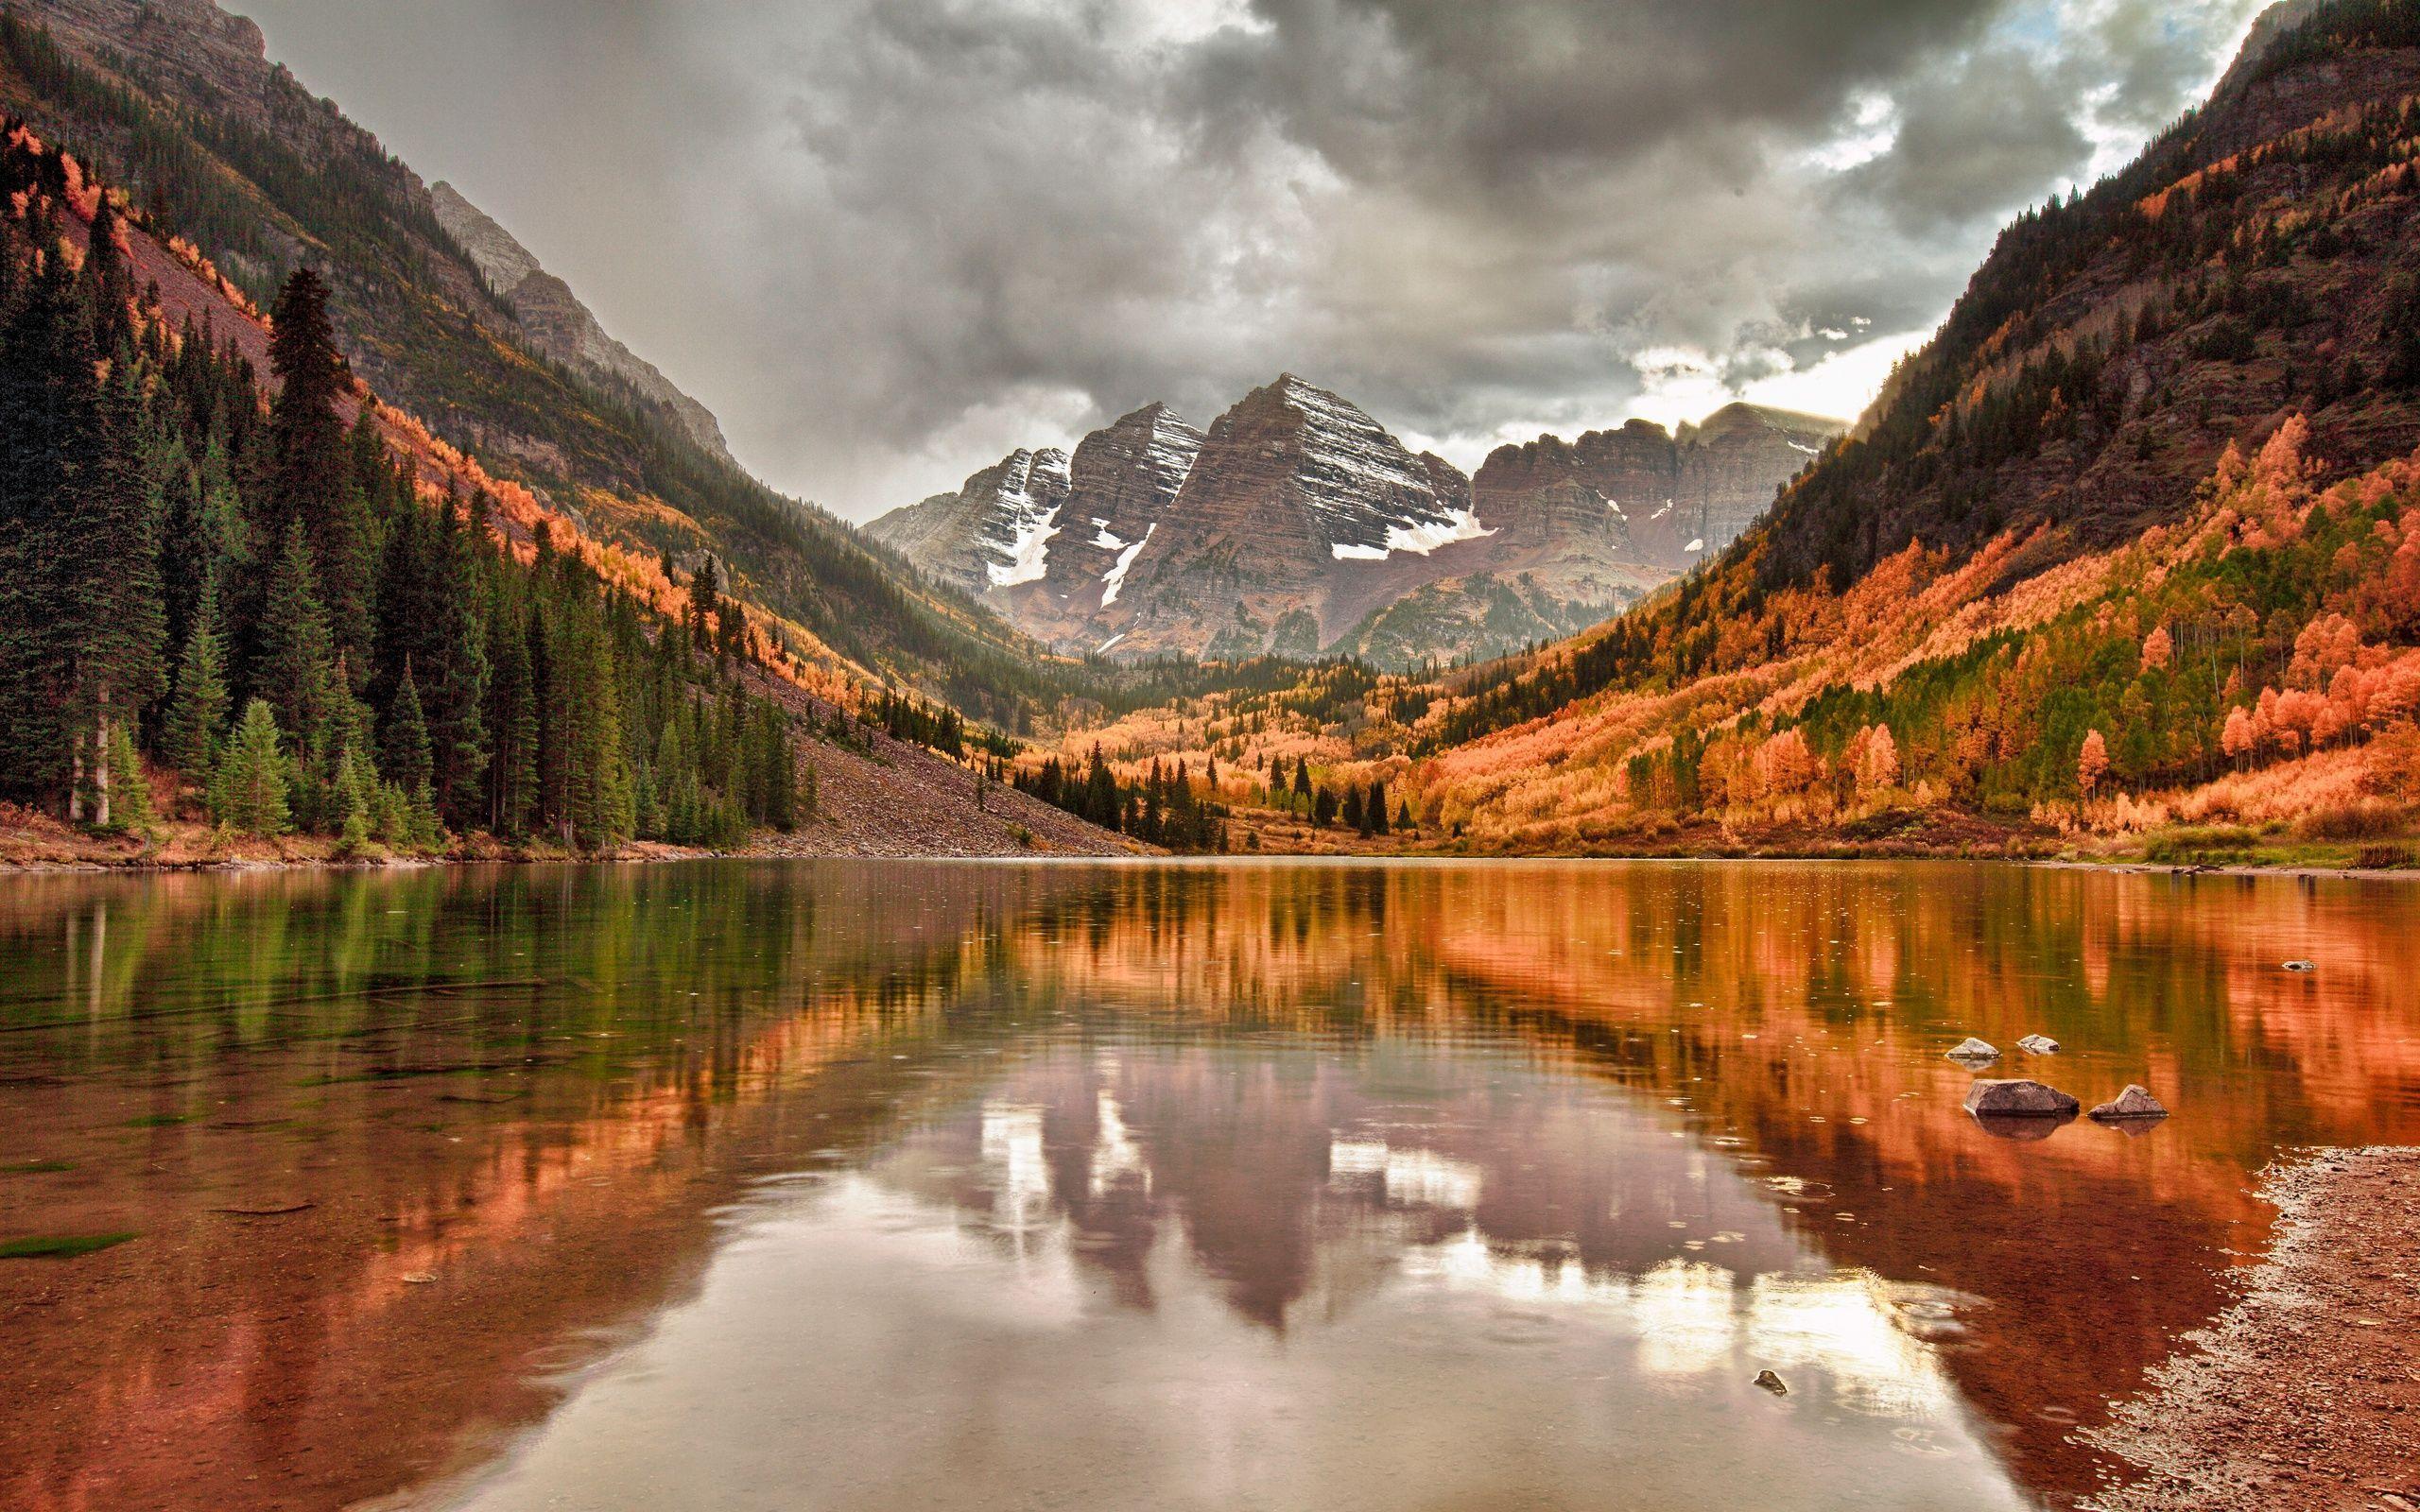 Fall Mountain Lake Wallpapers Top Free Fall Mountain Lake Backgrounds Wallpaperaccess